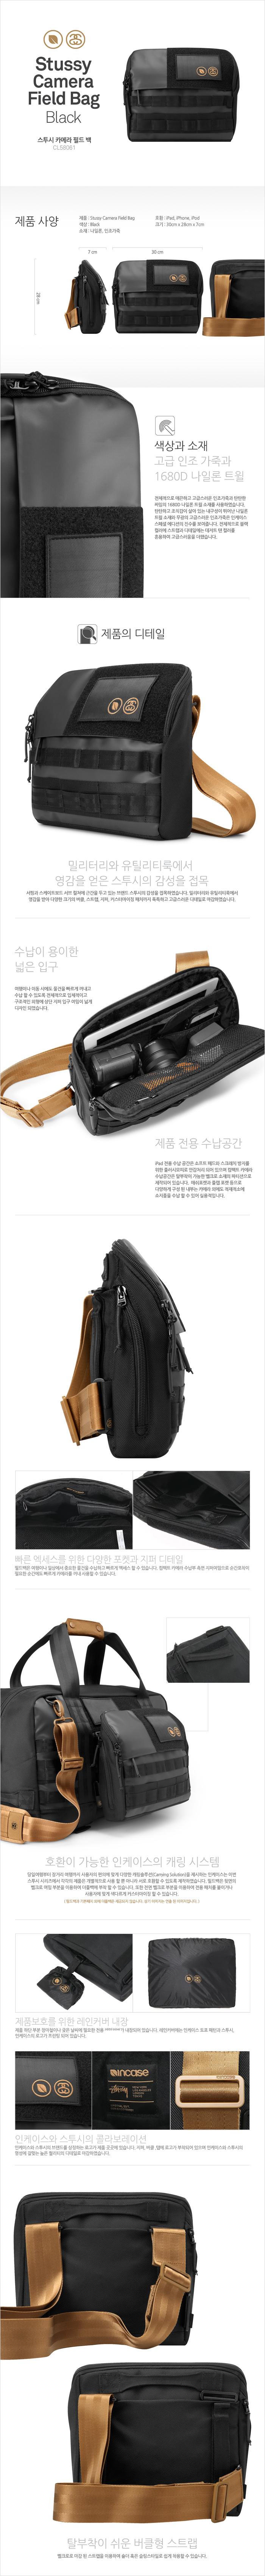 Stussy Camera Field Bag - Incase Korea. A better experience through good design.